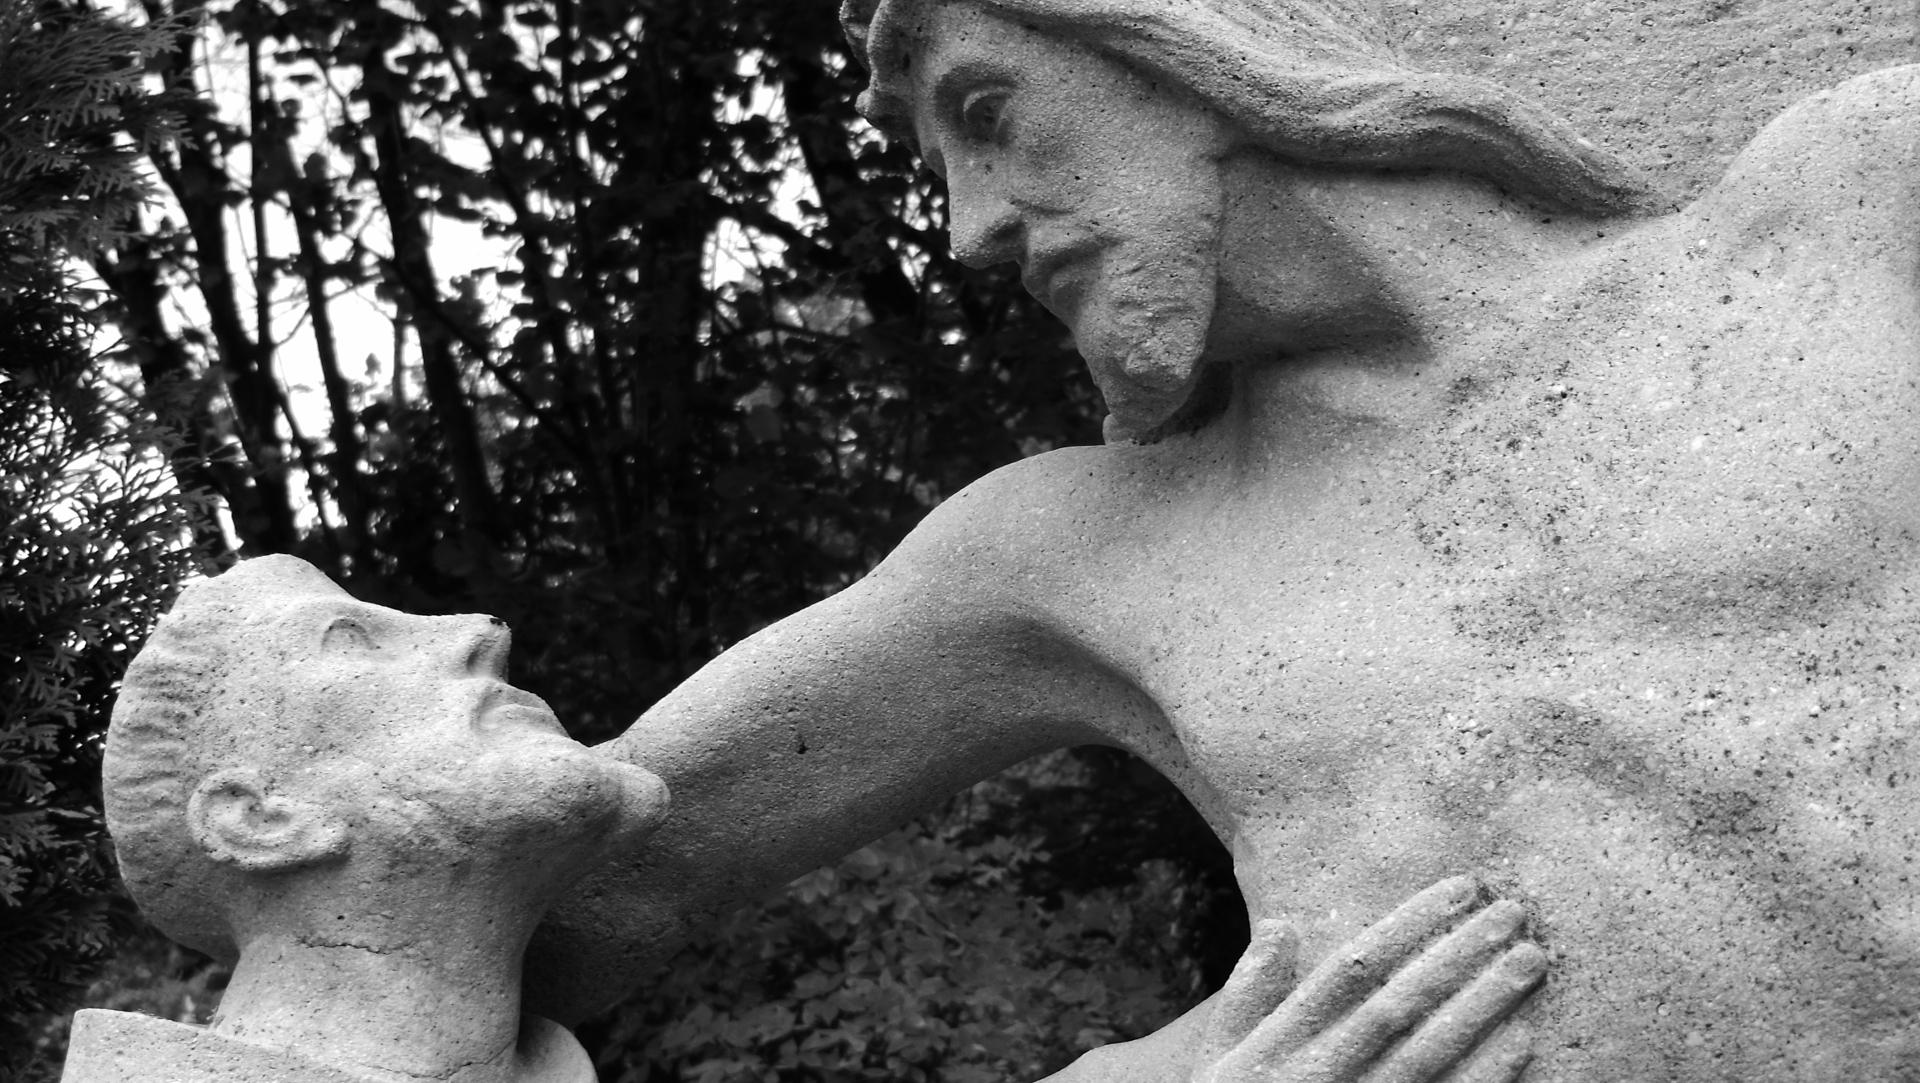 Begegnung mit Jesus | © pixabay.com